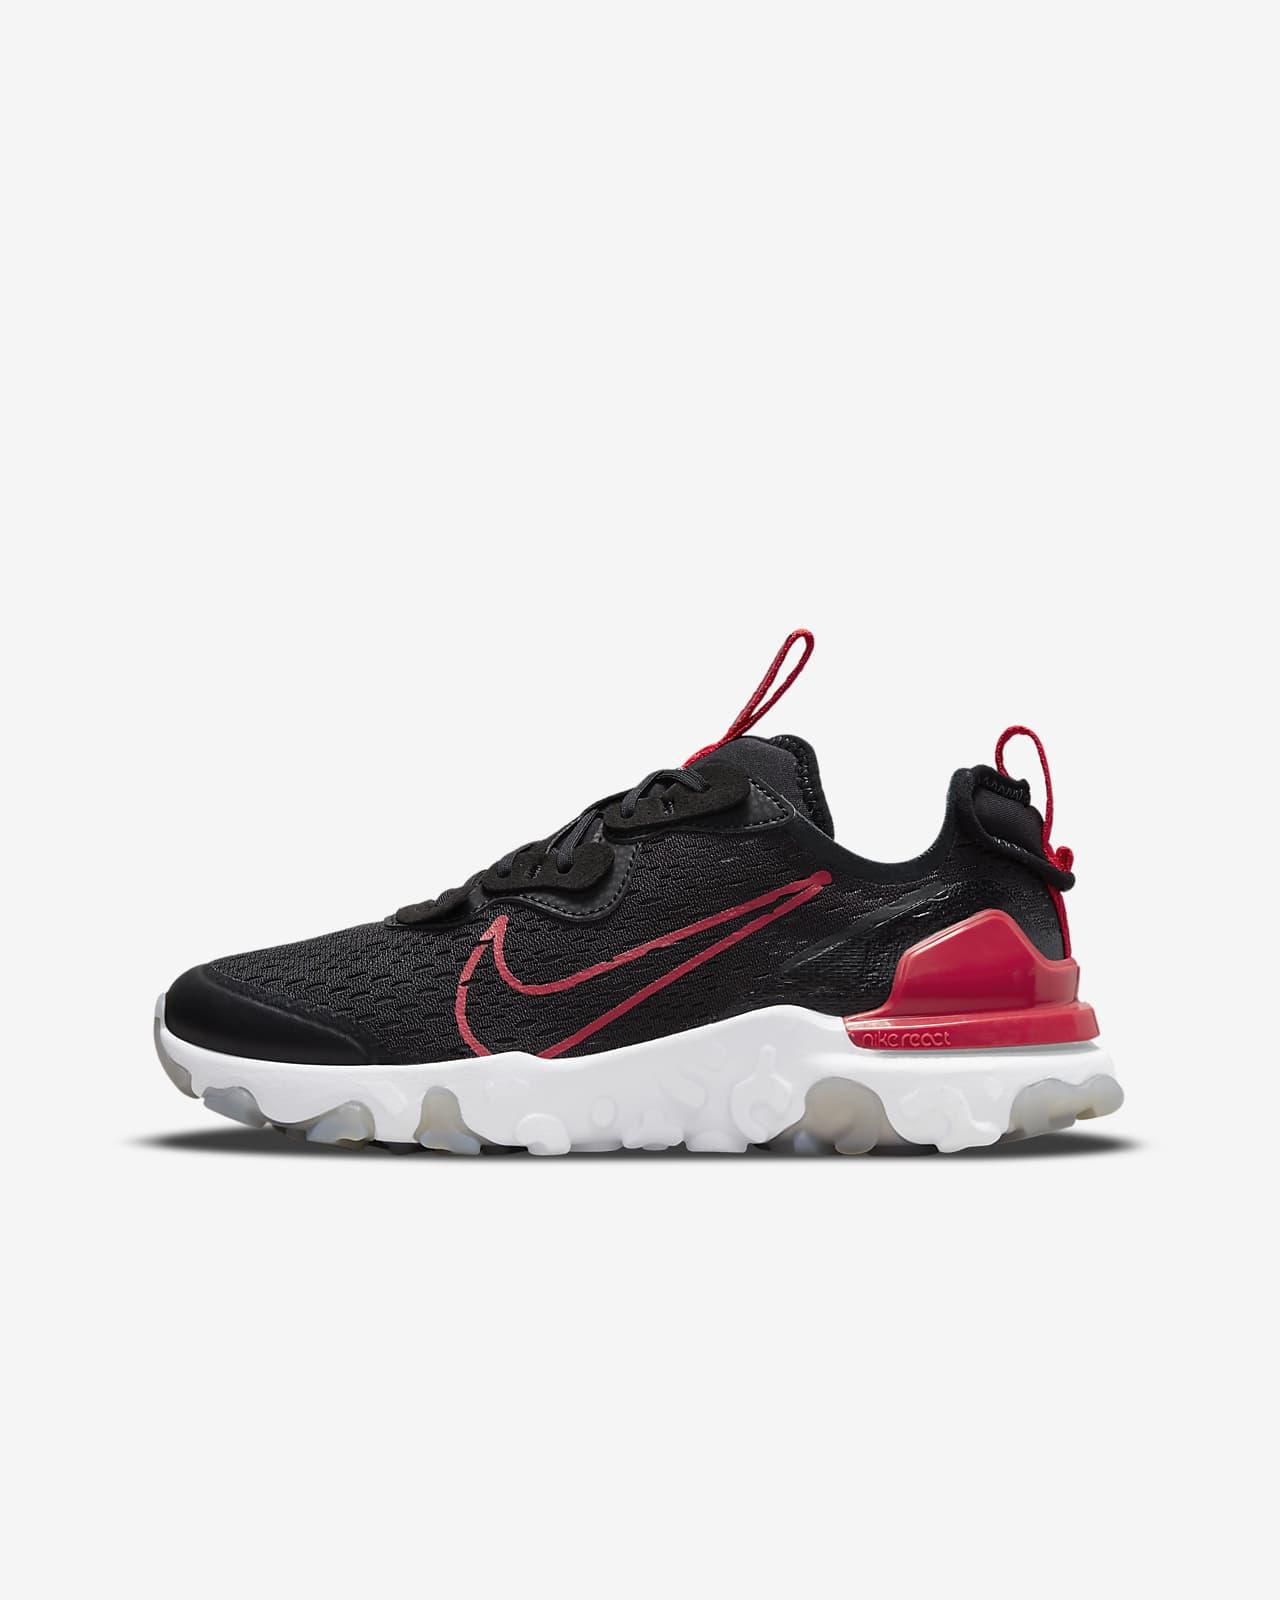 Sapatilhas Nike React Vision Júnior